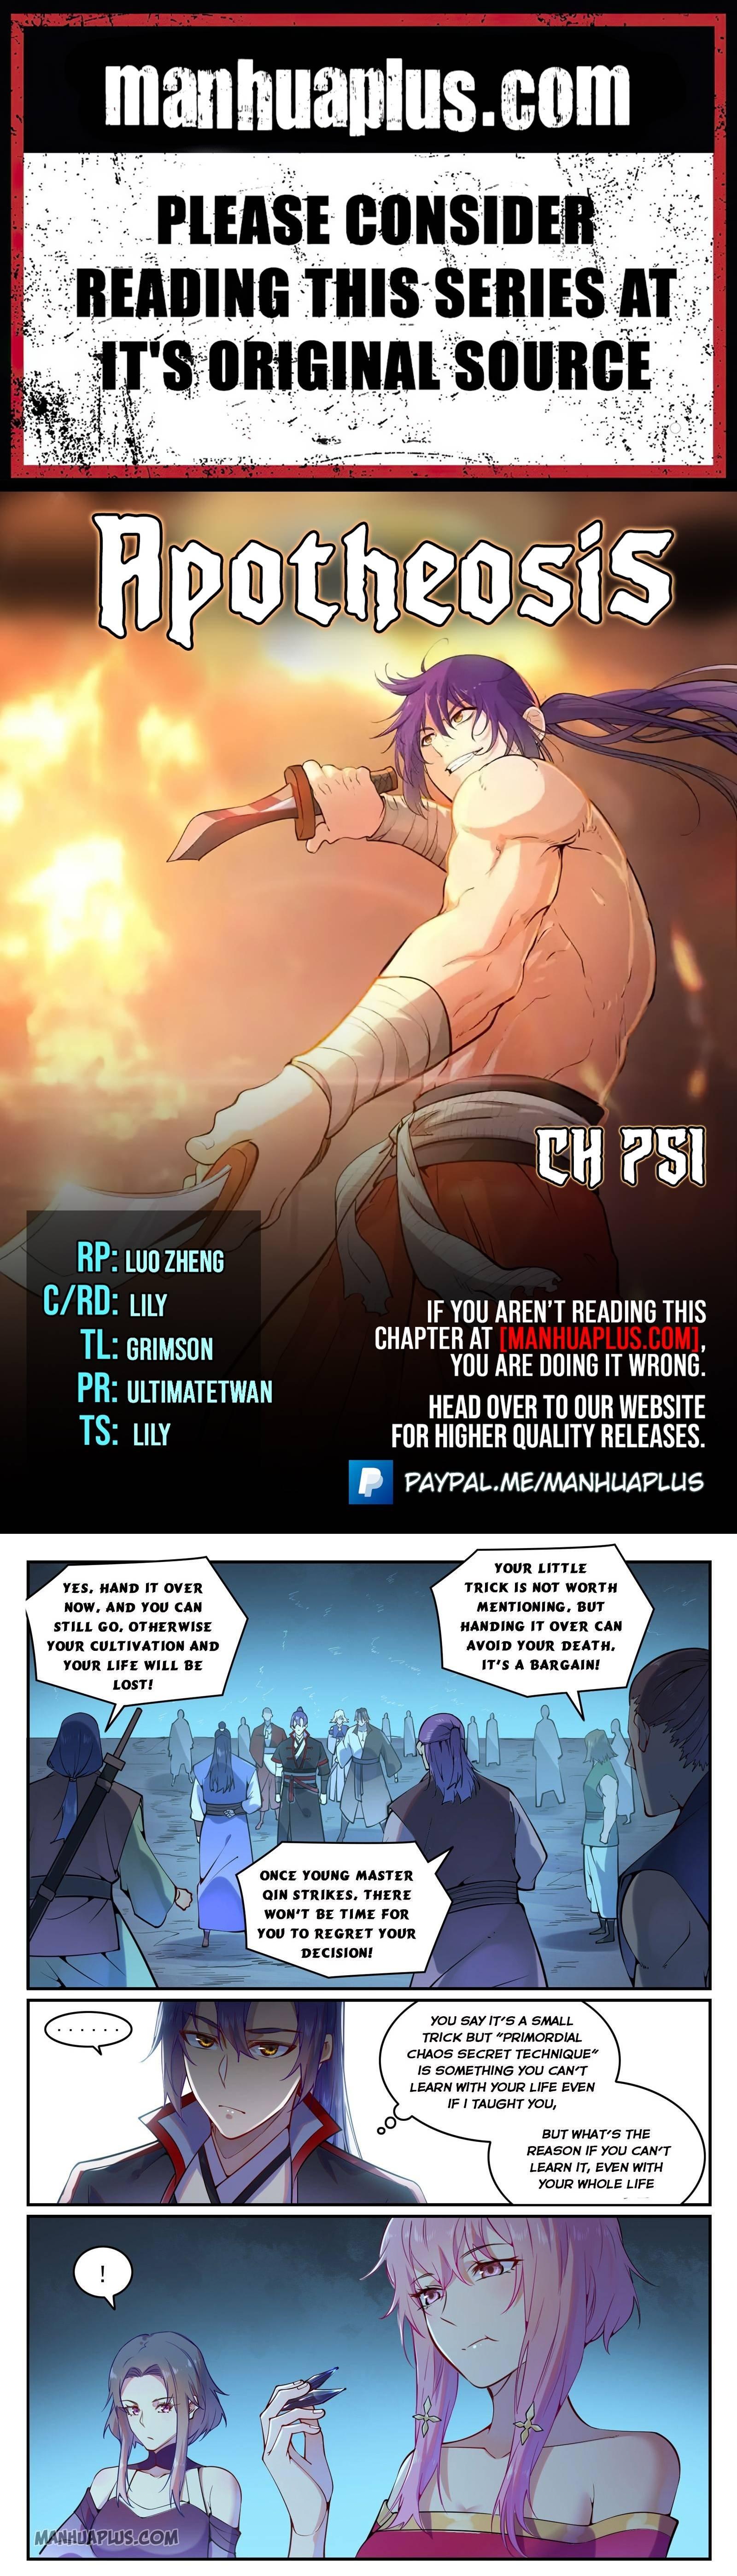 Manga Apotheosis - Chapter 751 Page 1